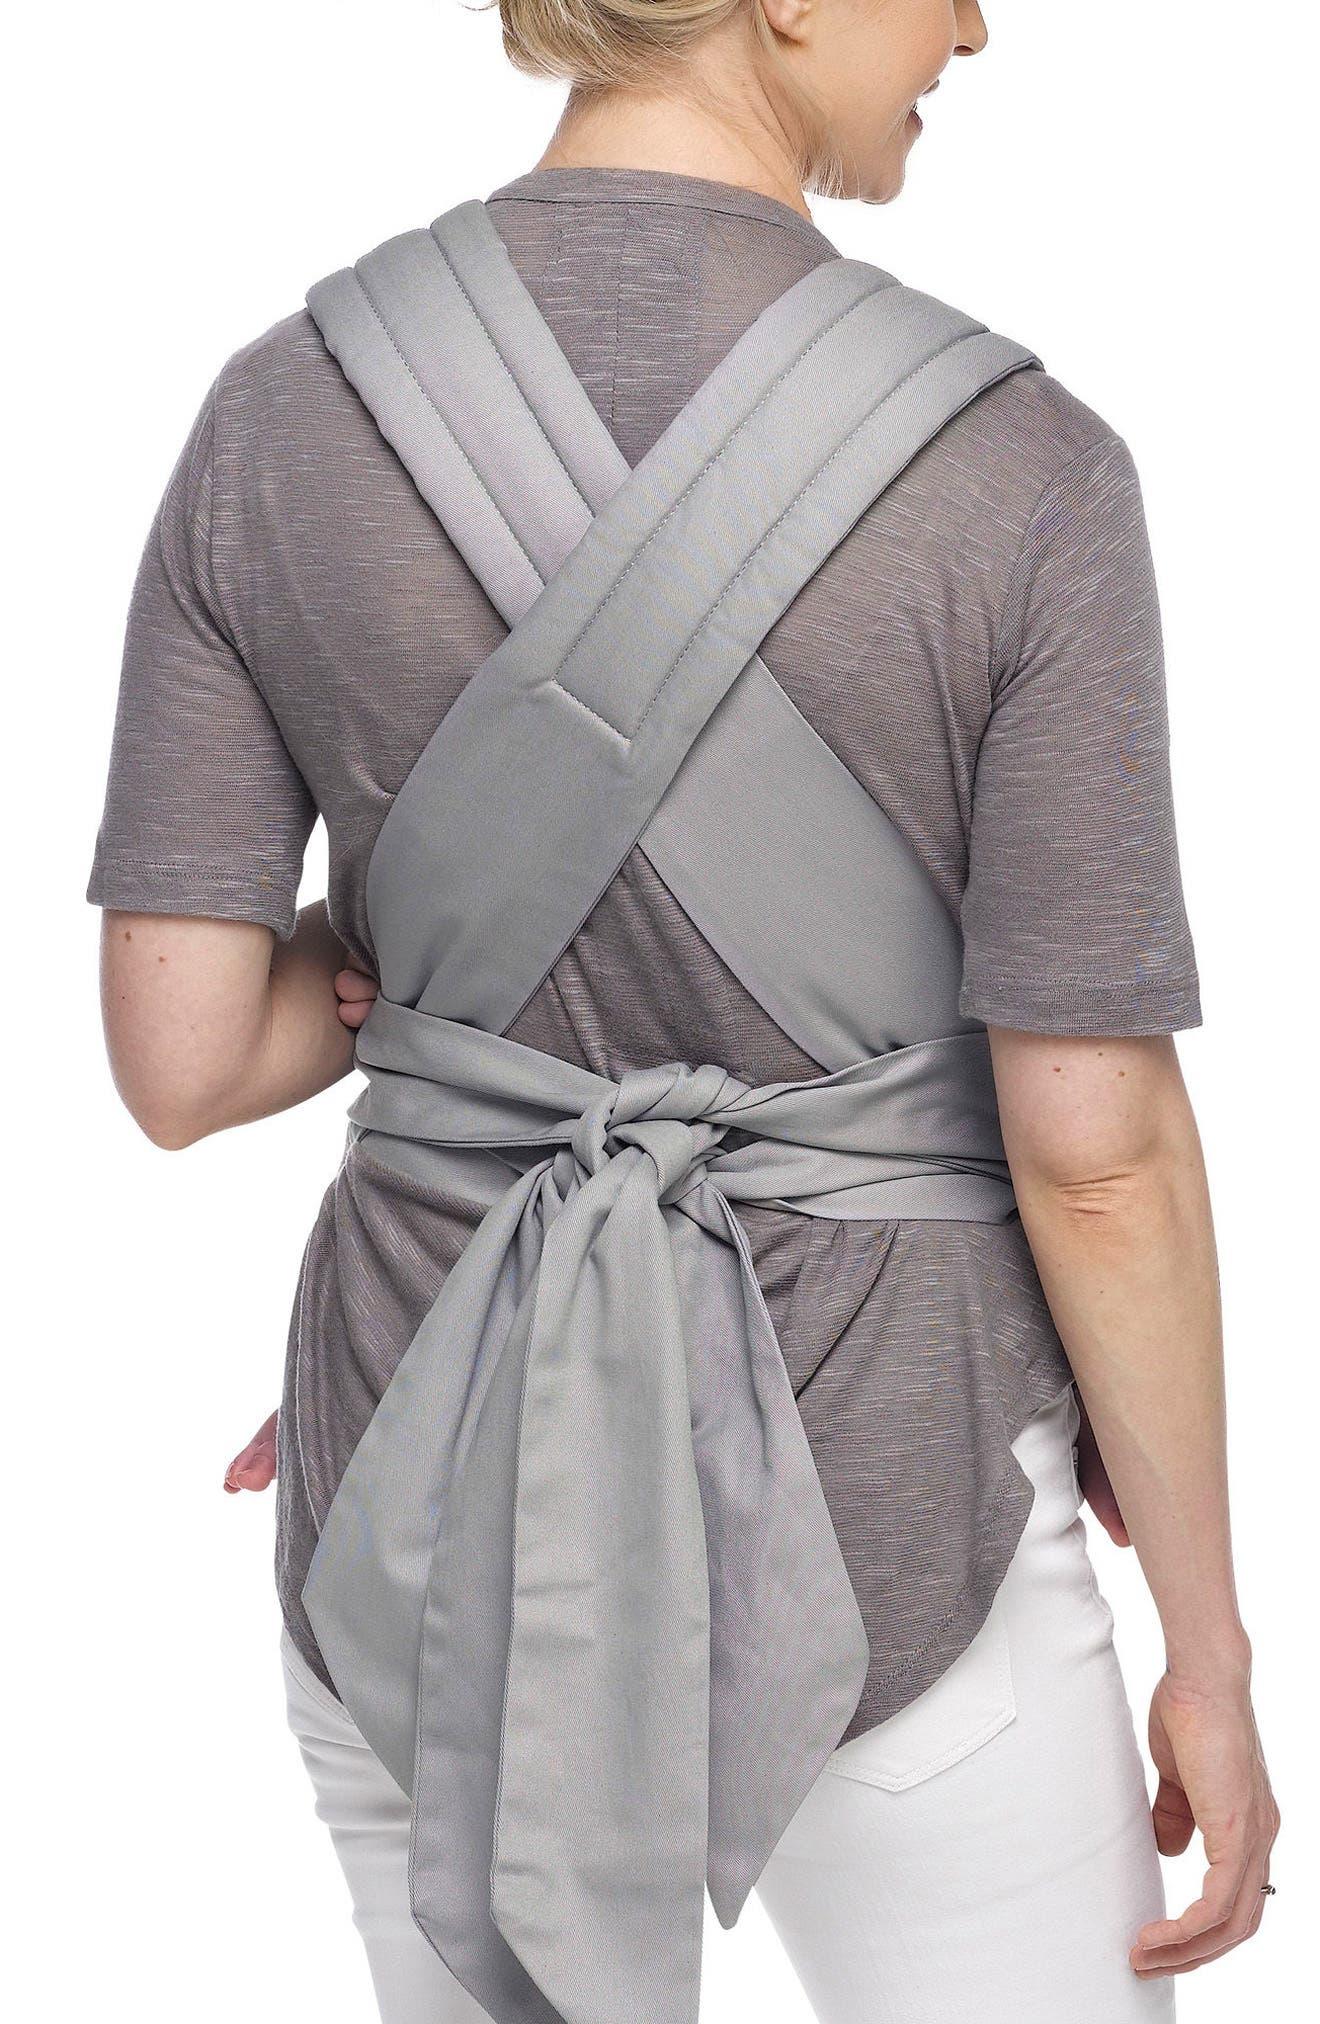 Wrap Double Tie Baby Carrier,                             Alternate thumbnail 4, color,